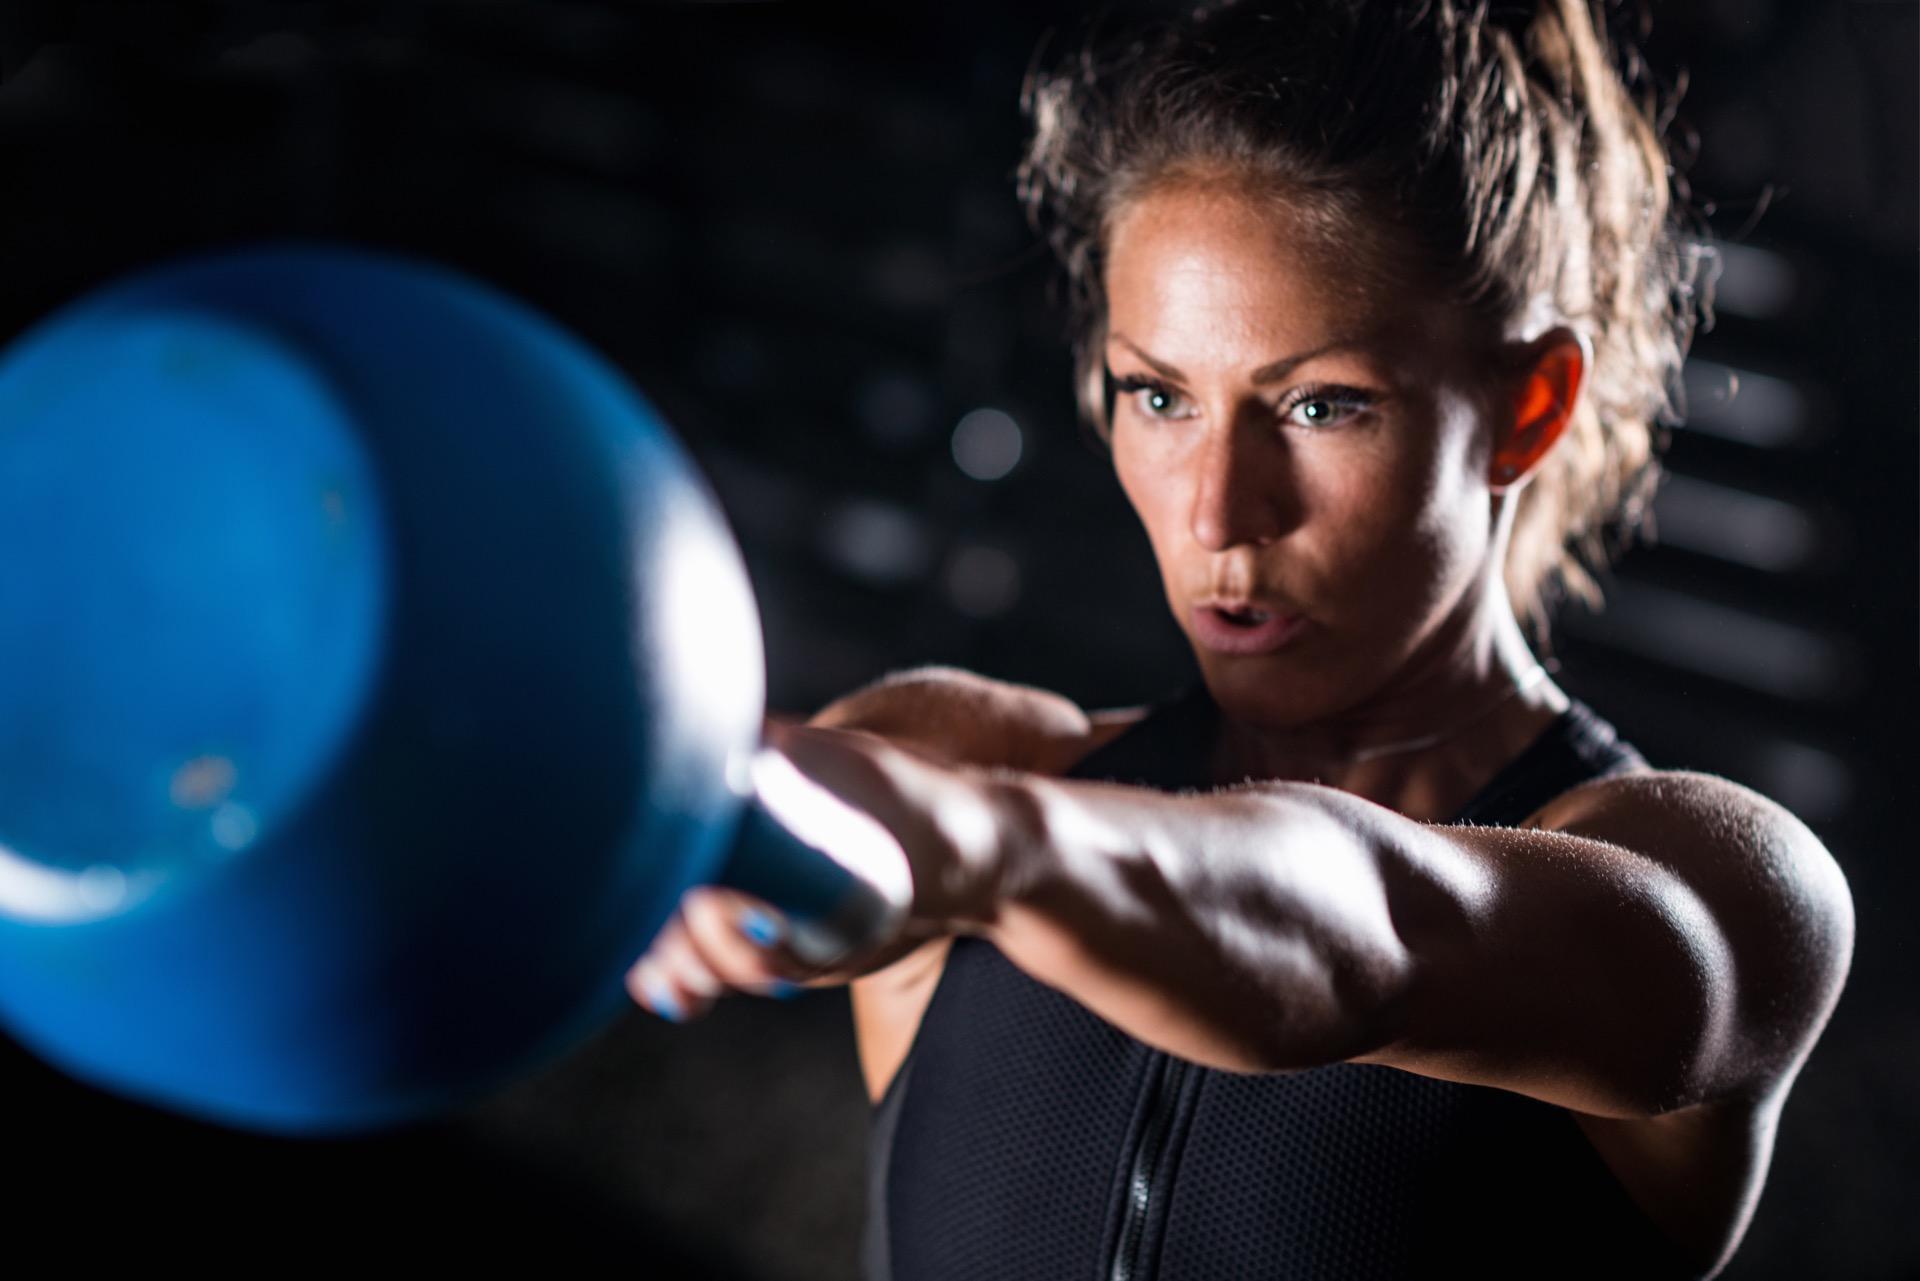 hvor mange kalorier forbrenner man ved styrketrening